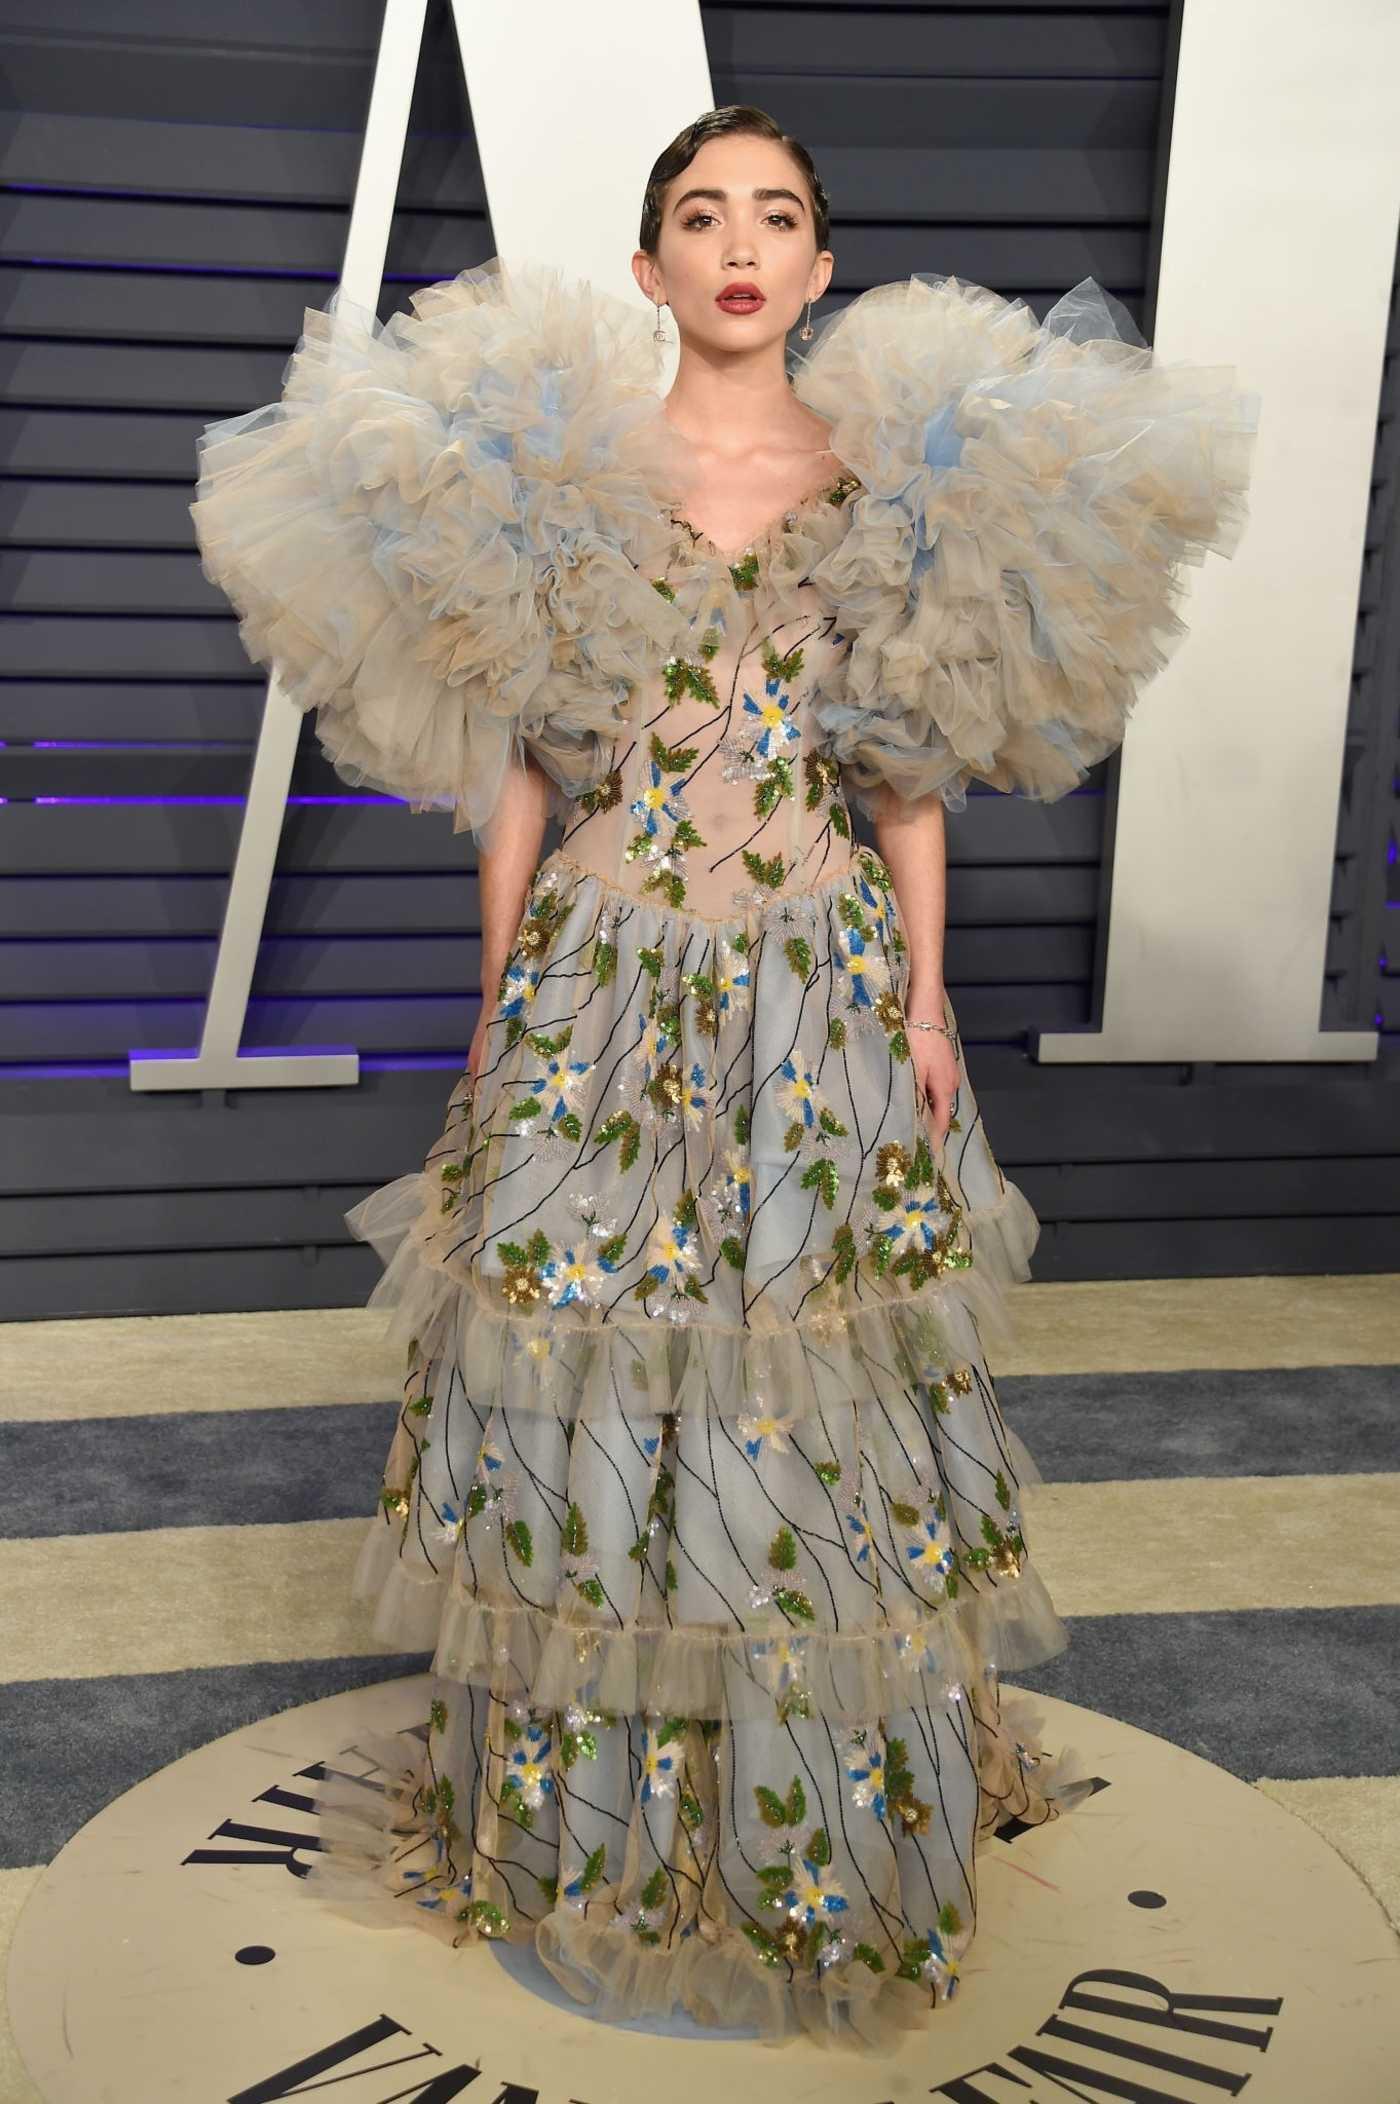 Rowan Blanchard Attends 2019 Vanity Fair Oscar Party in Beverly Hills 02/24/2019